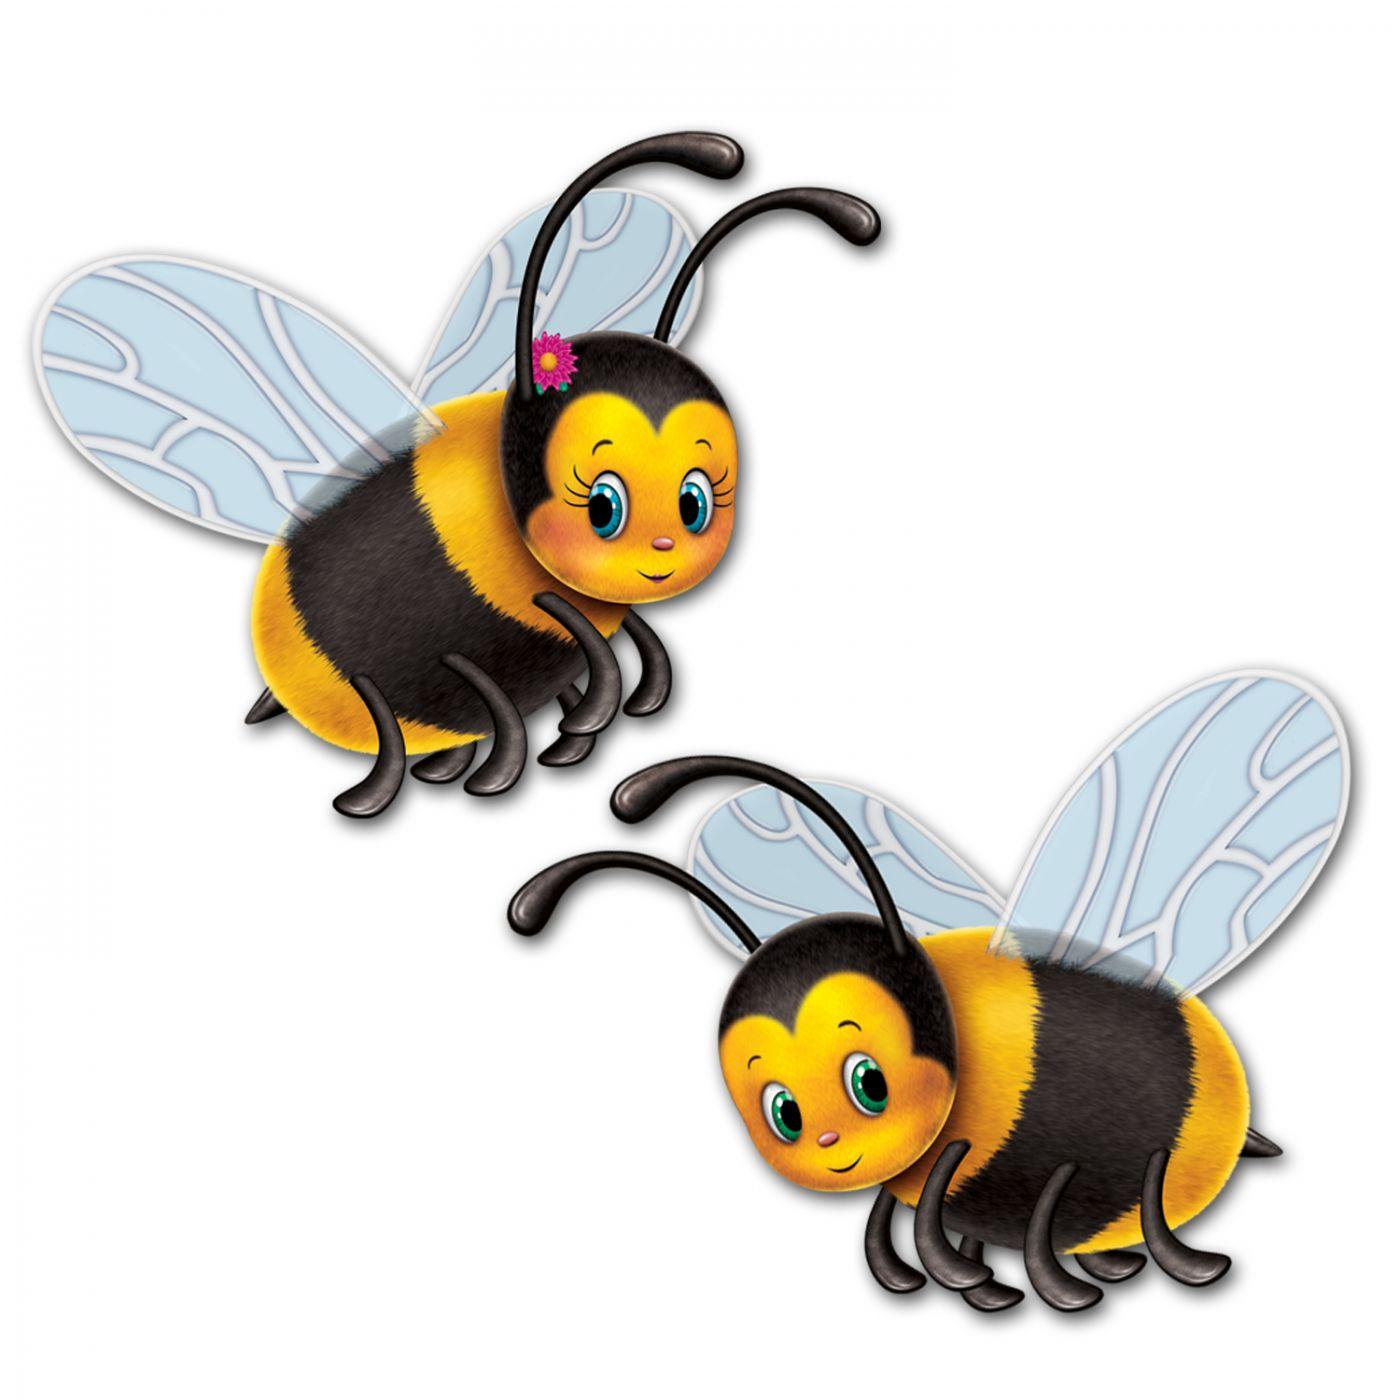 Image of Bumblebee Cutouts